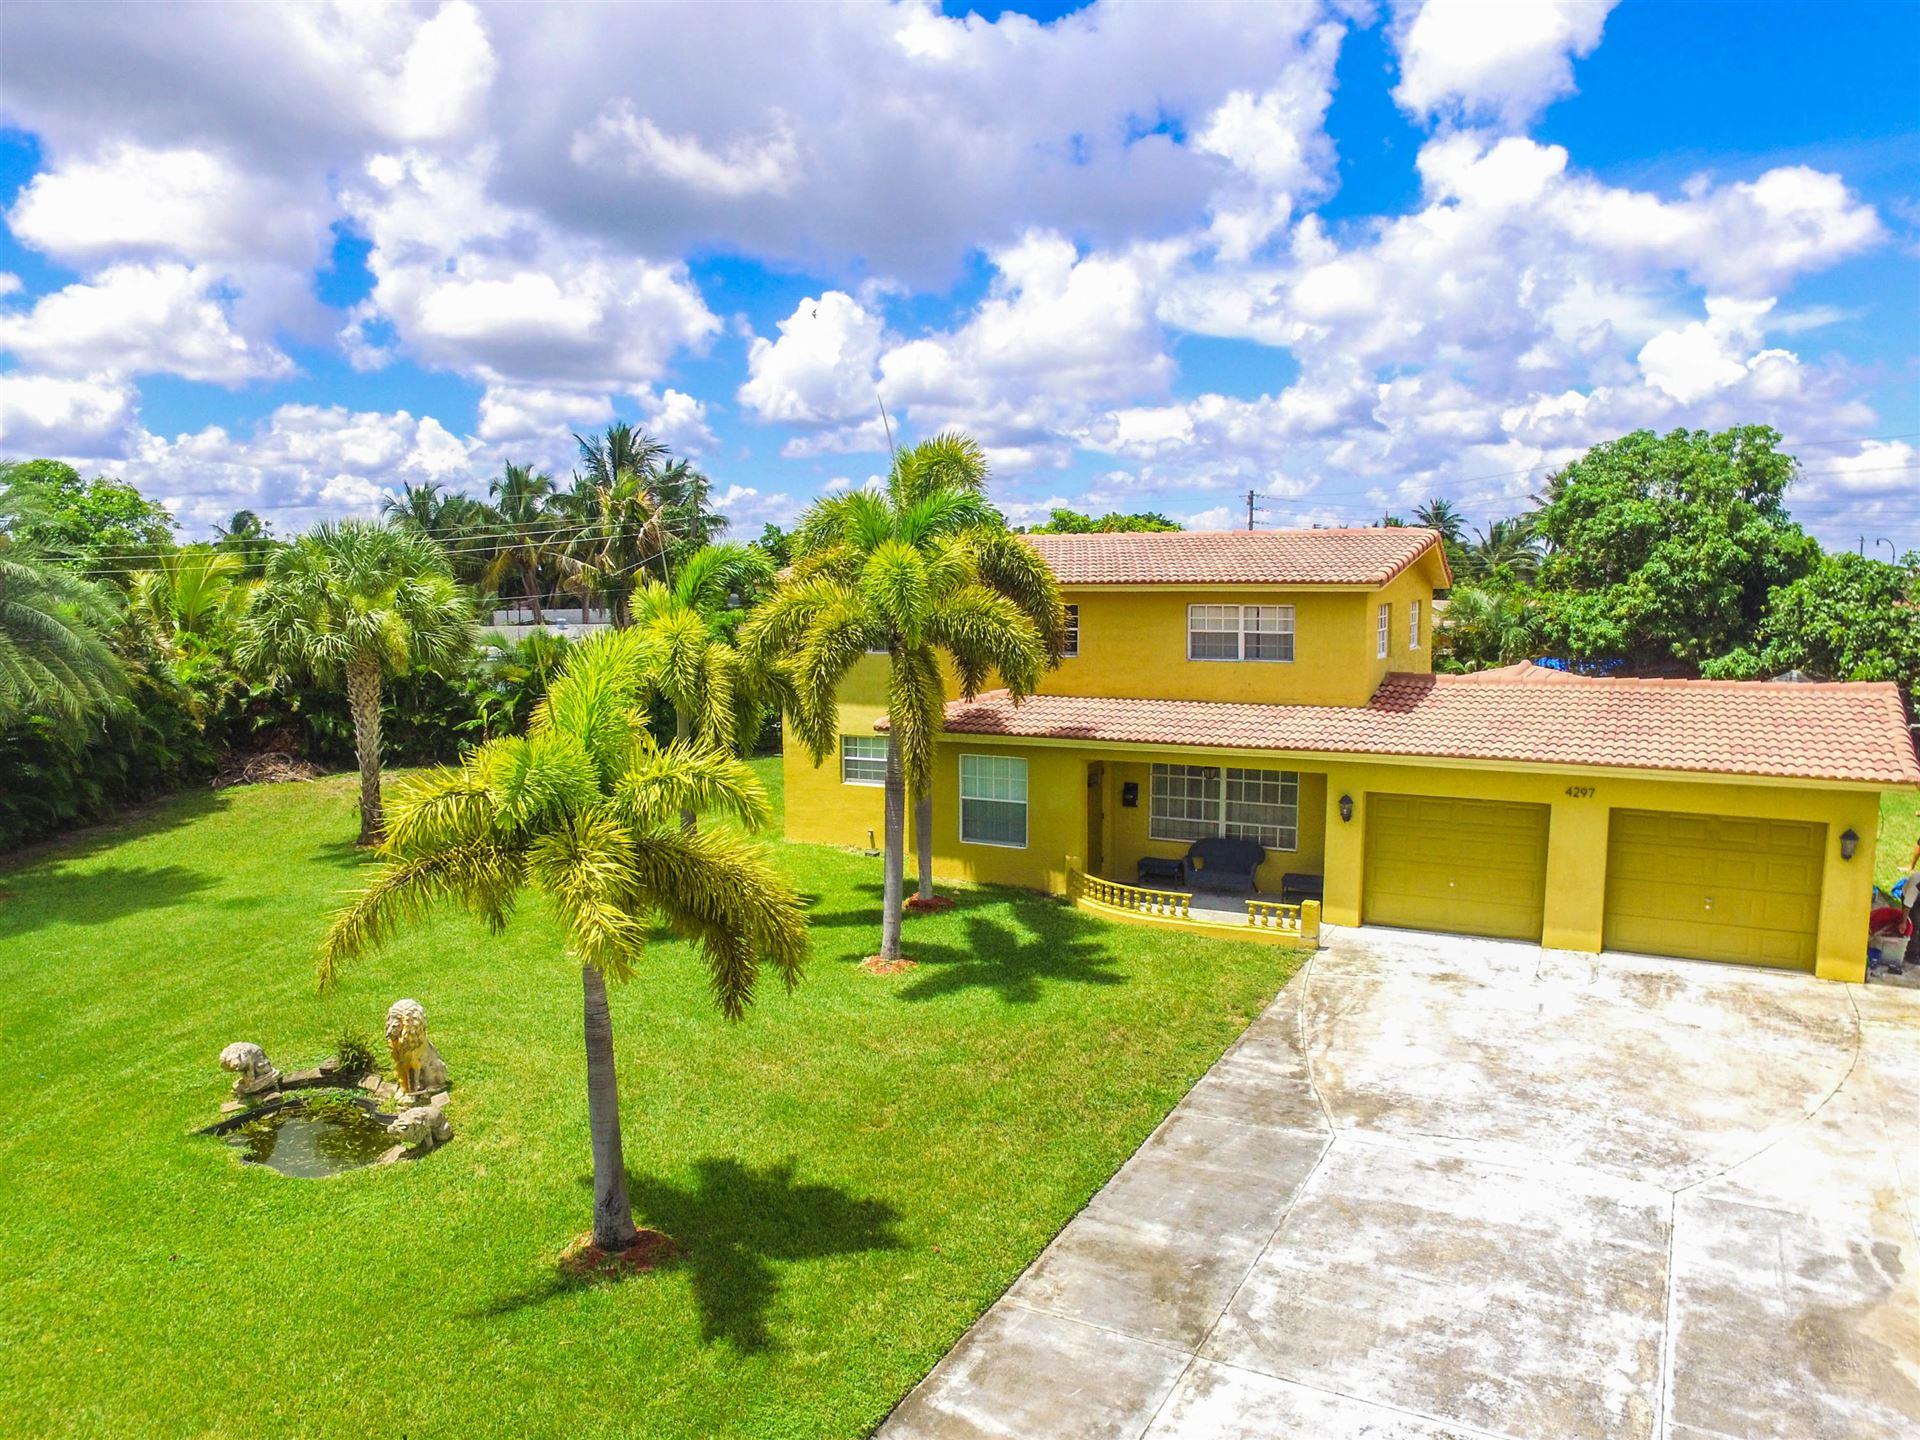 4297 NW 34 Ter Terrace, Lauderdale Lakes, FL 33309 - #: RX-10618665